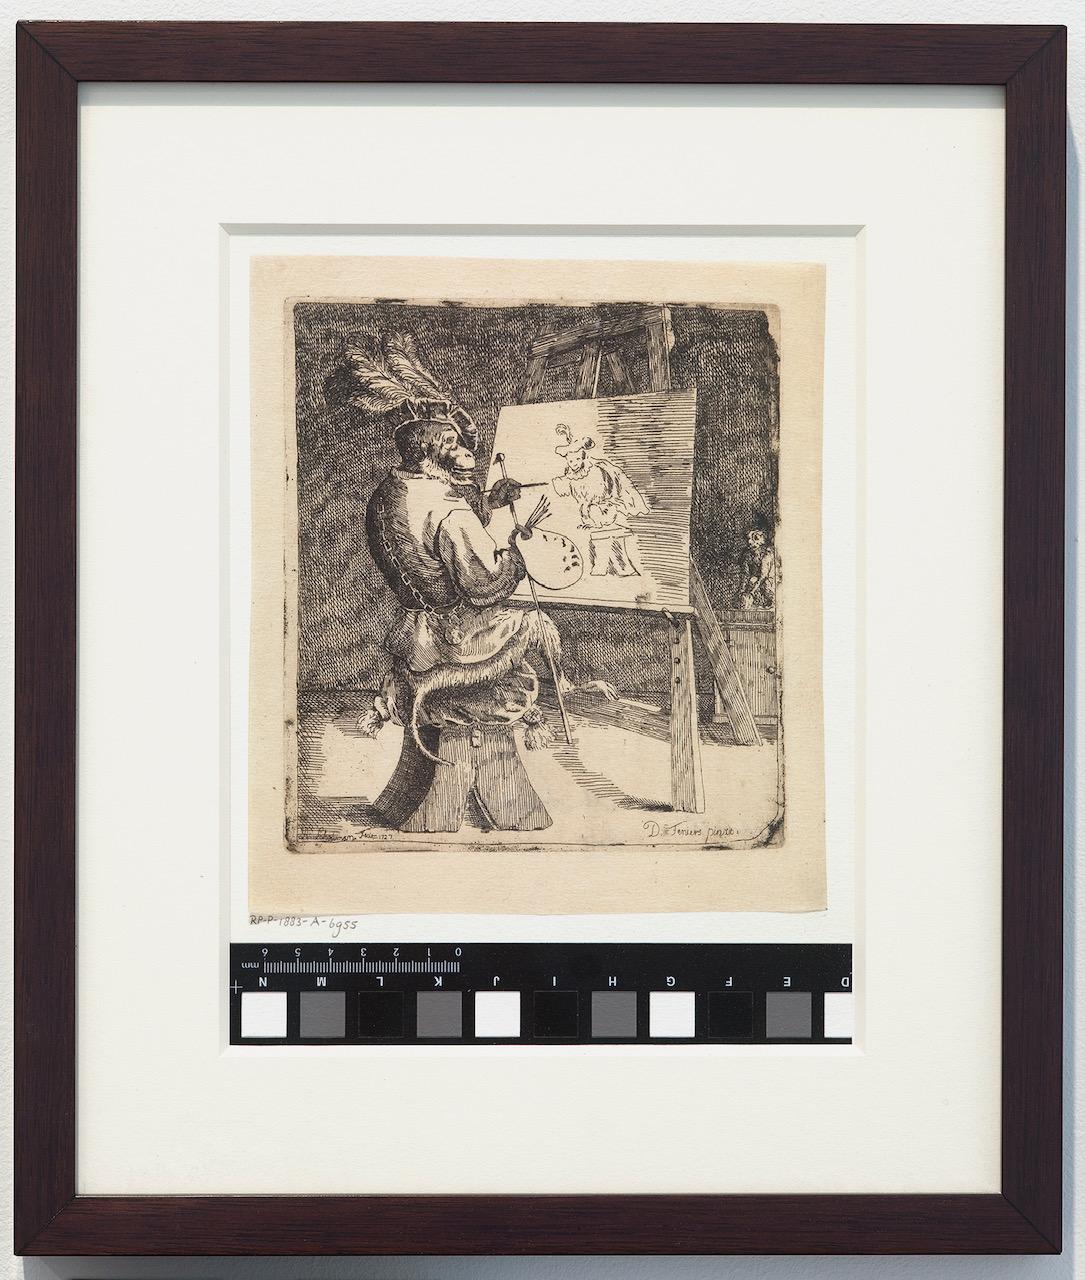 Zorawar_Painting Monkey after Aert Schouman and David Teniers.jpg